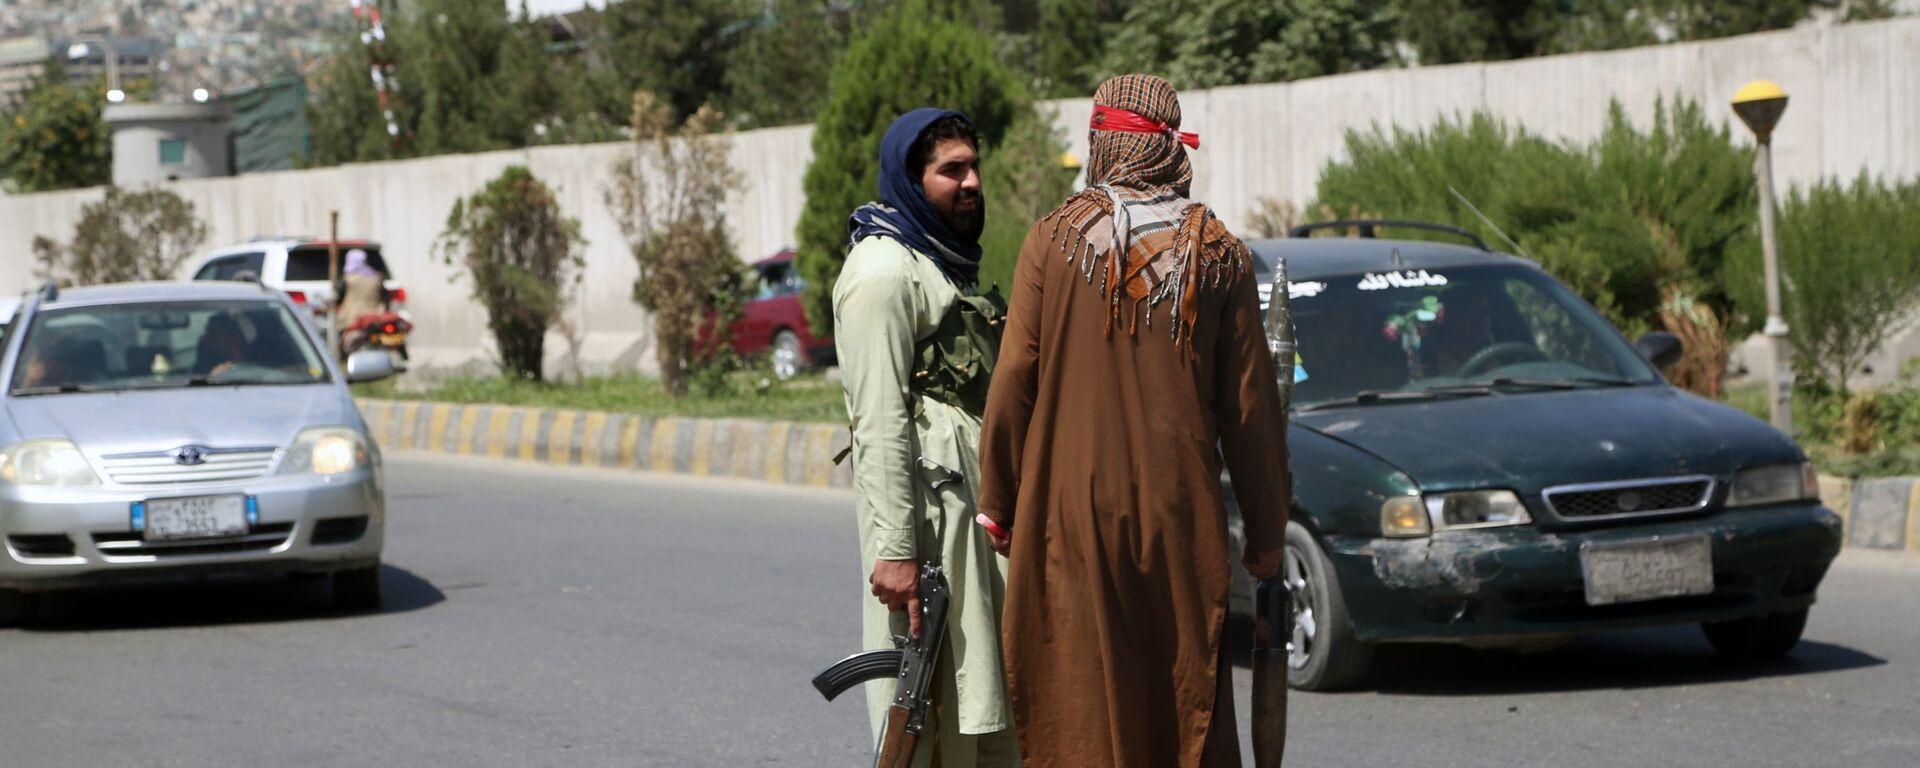 Боевики движения Талибан в Кабуле (16 августа 2021). Афганистан - Sputnik Армения, 1920, 26.09.2021